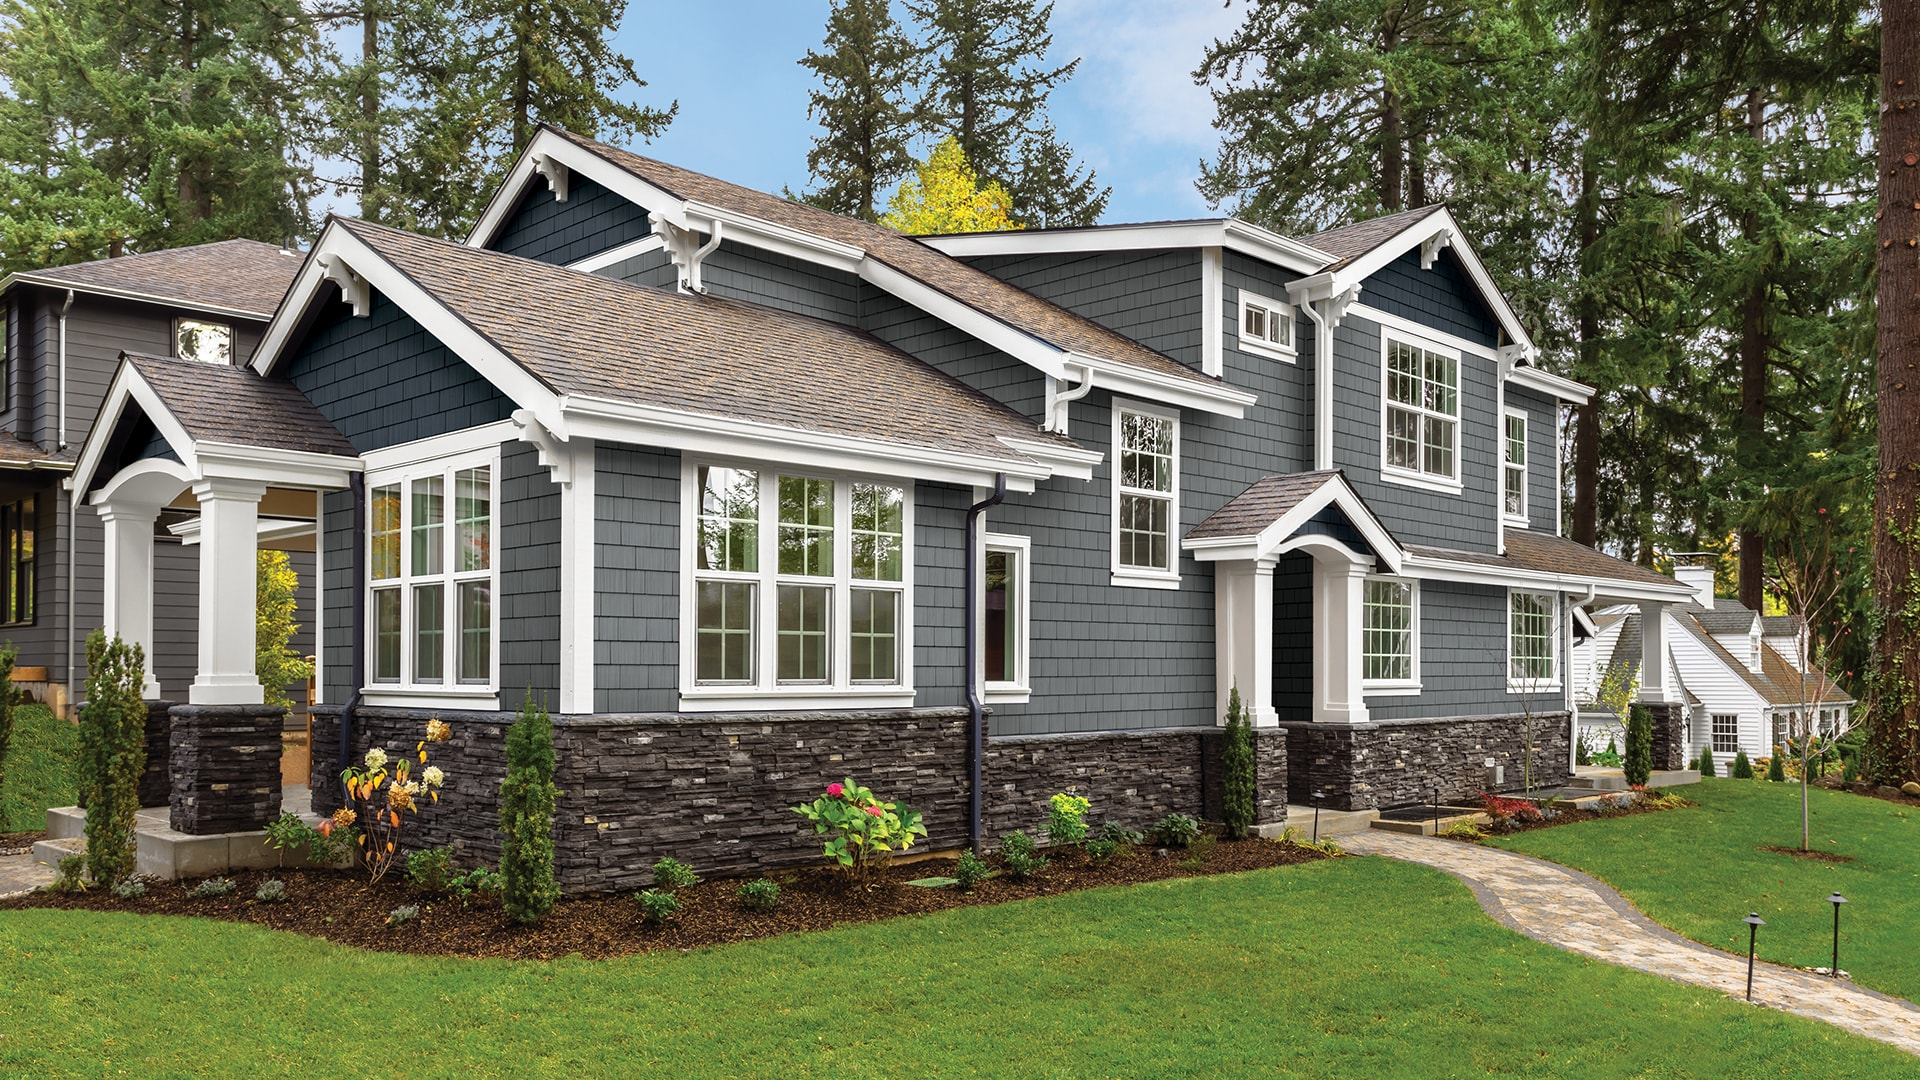 Home Exterior Design Gallery Amp Inspiration Royal